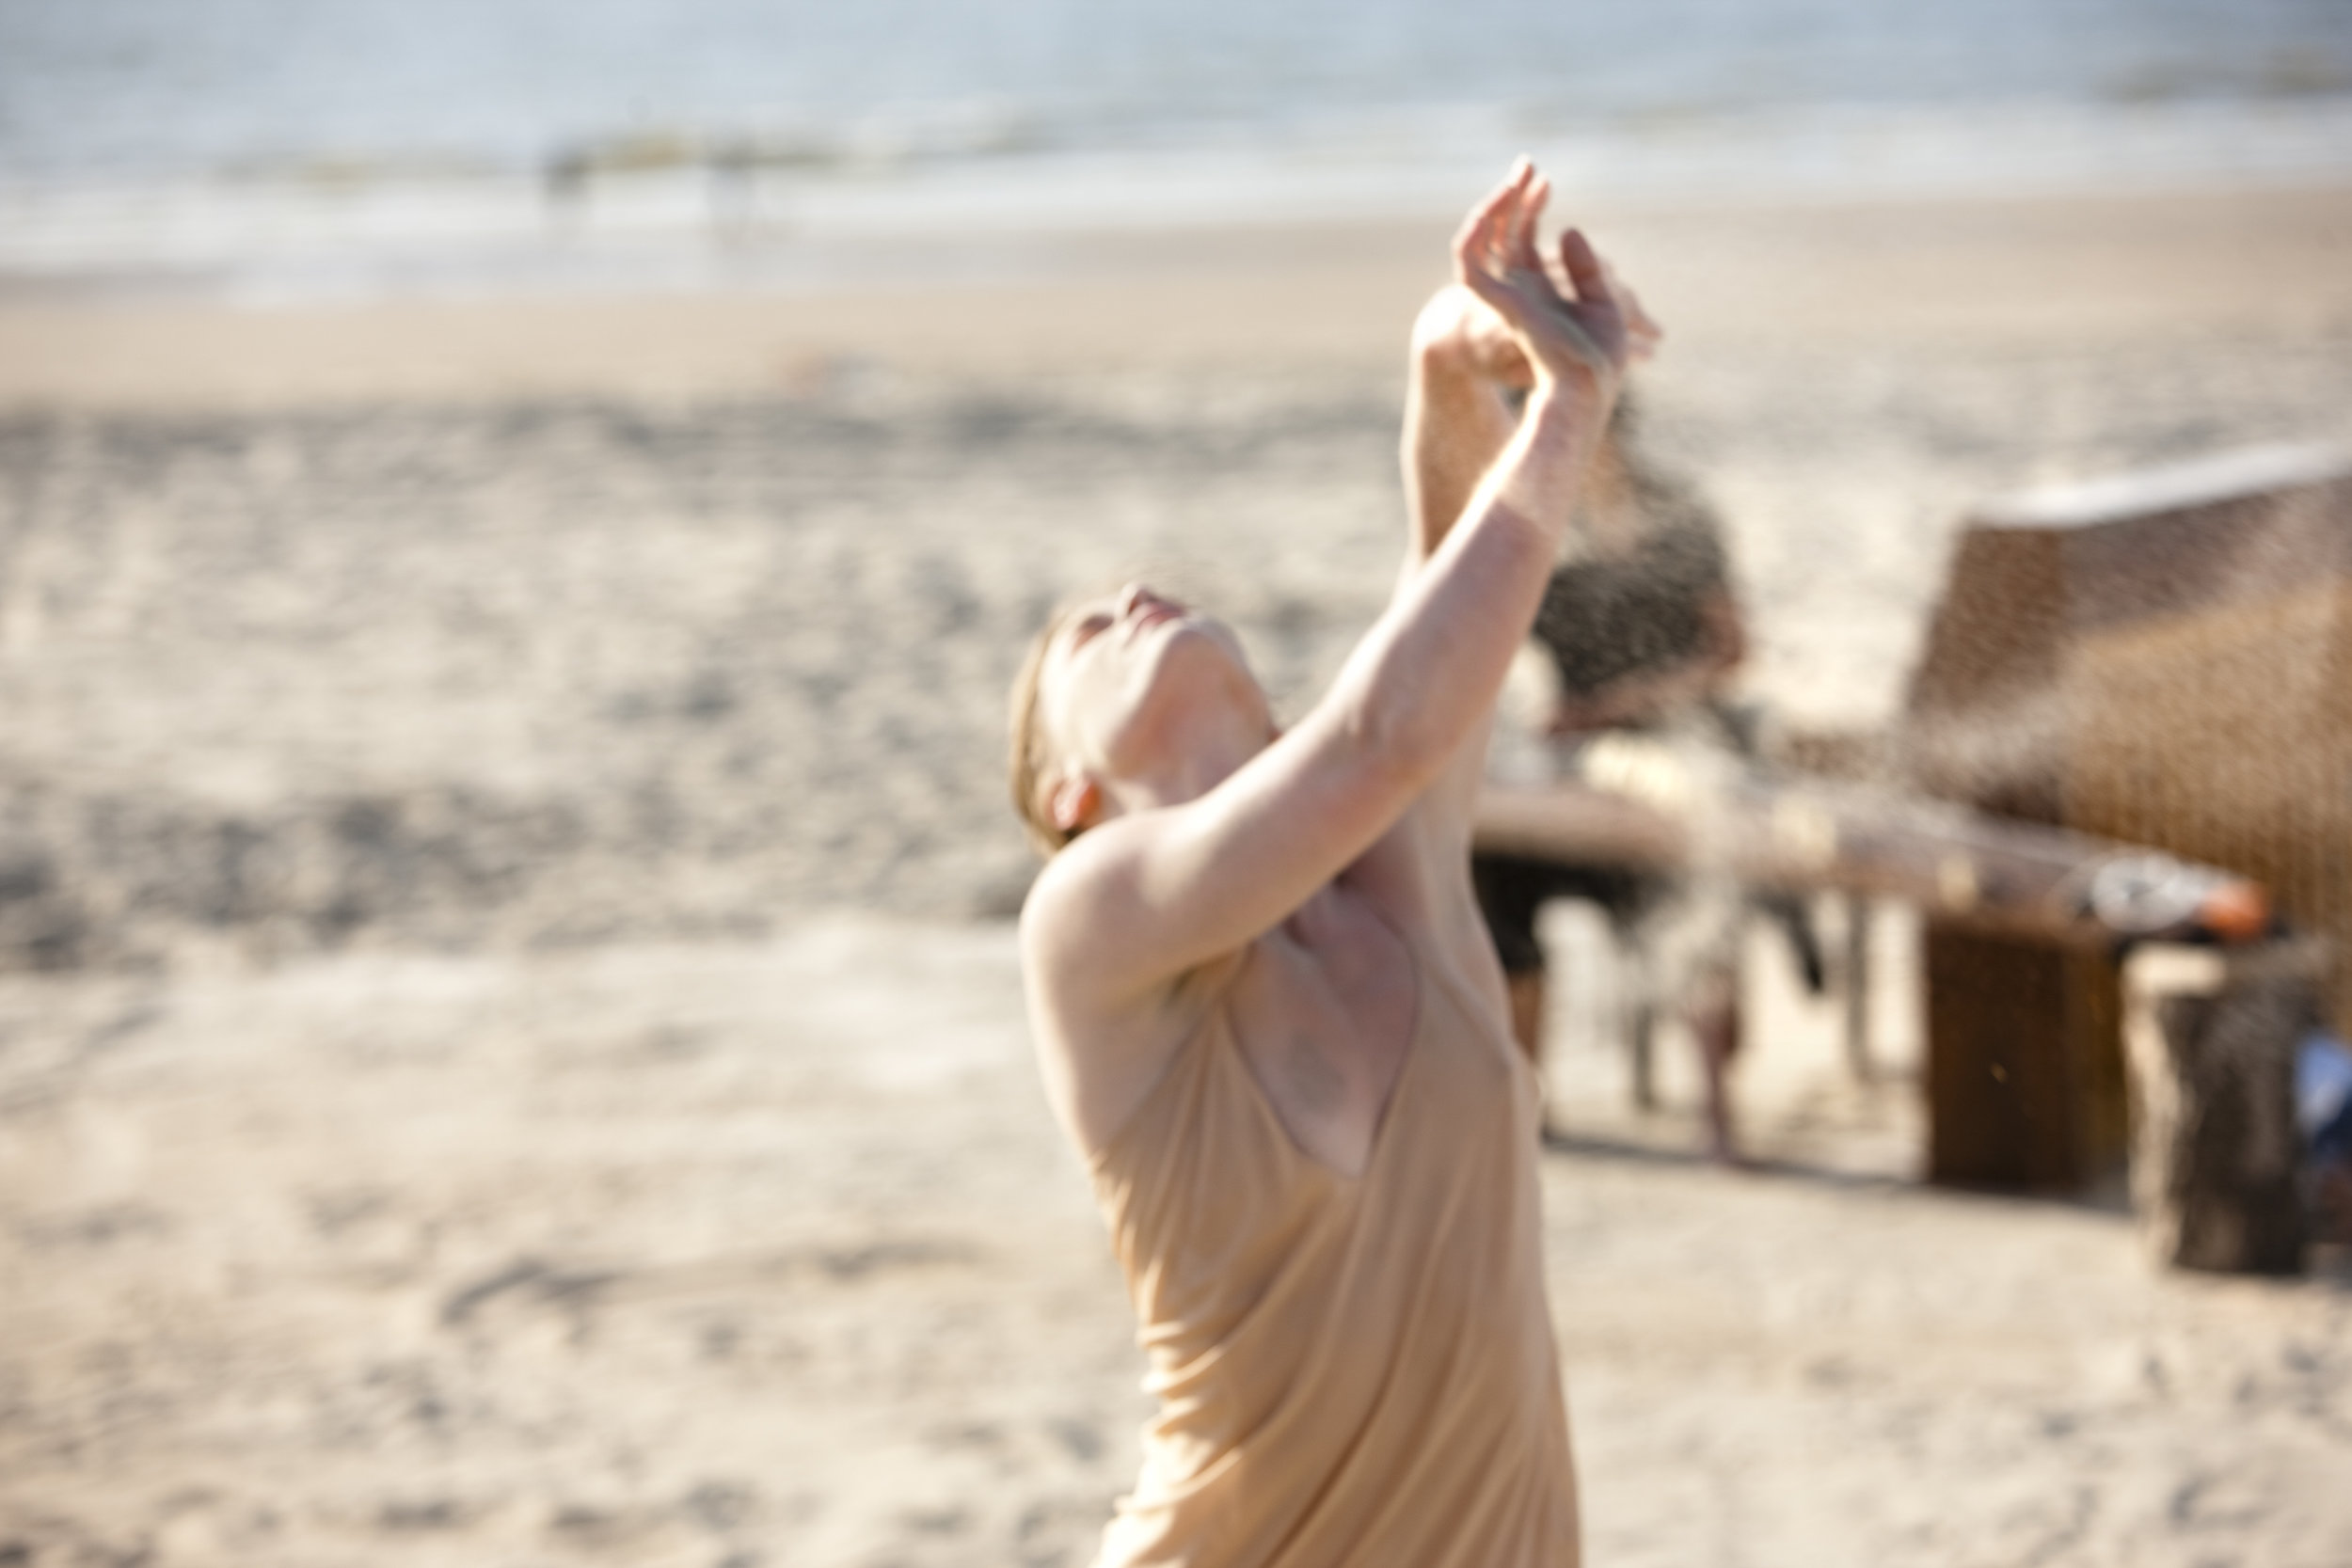 Rein - Choreography bySidi Larbi CherkaouiRead more